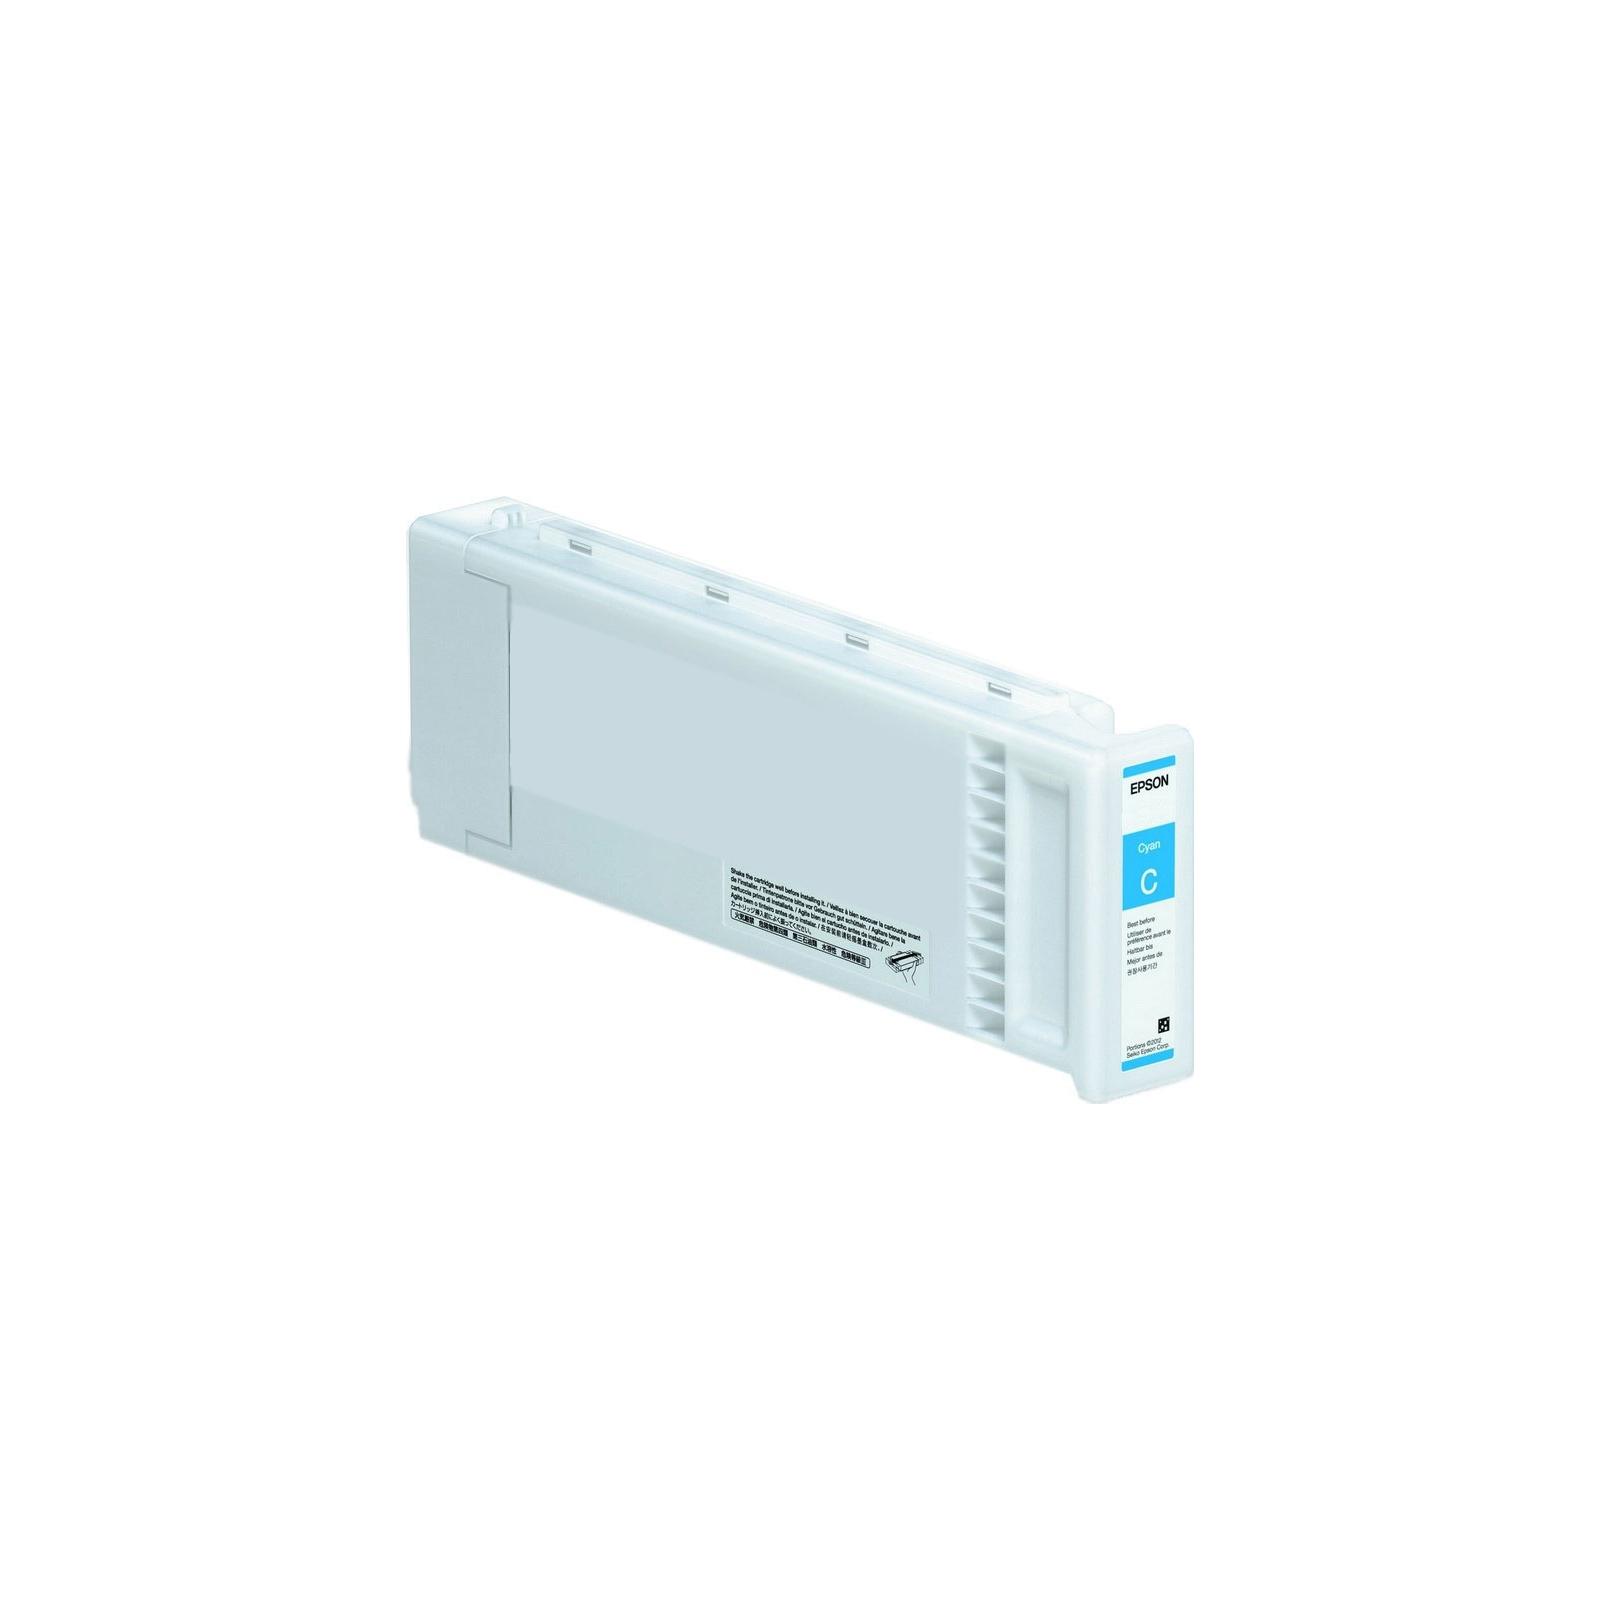 Картридж EPSON UltraChrome GS2 SC-S30610 Cyan, 700мл (C13T688200)